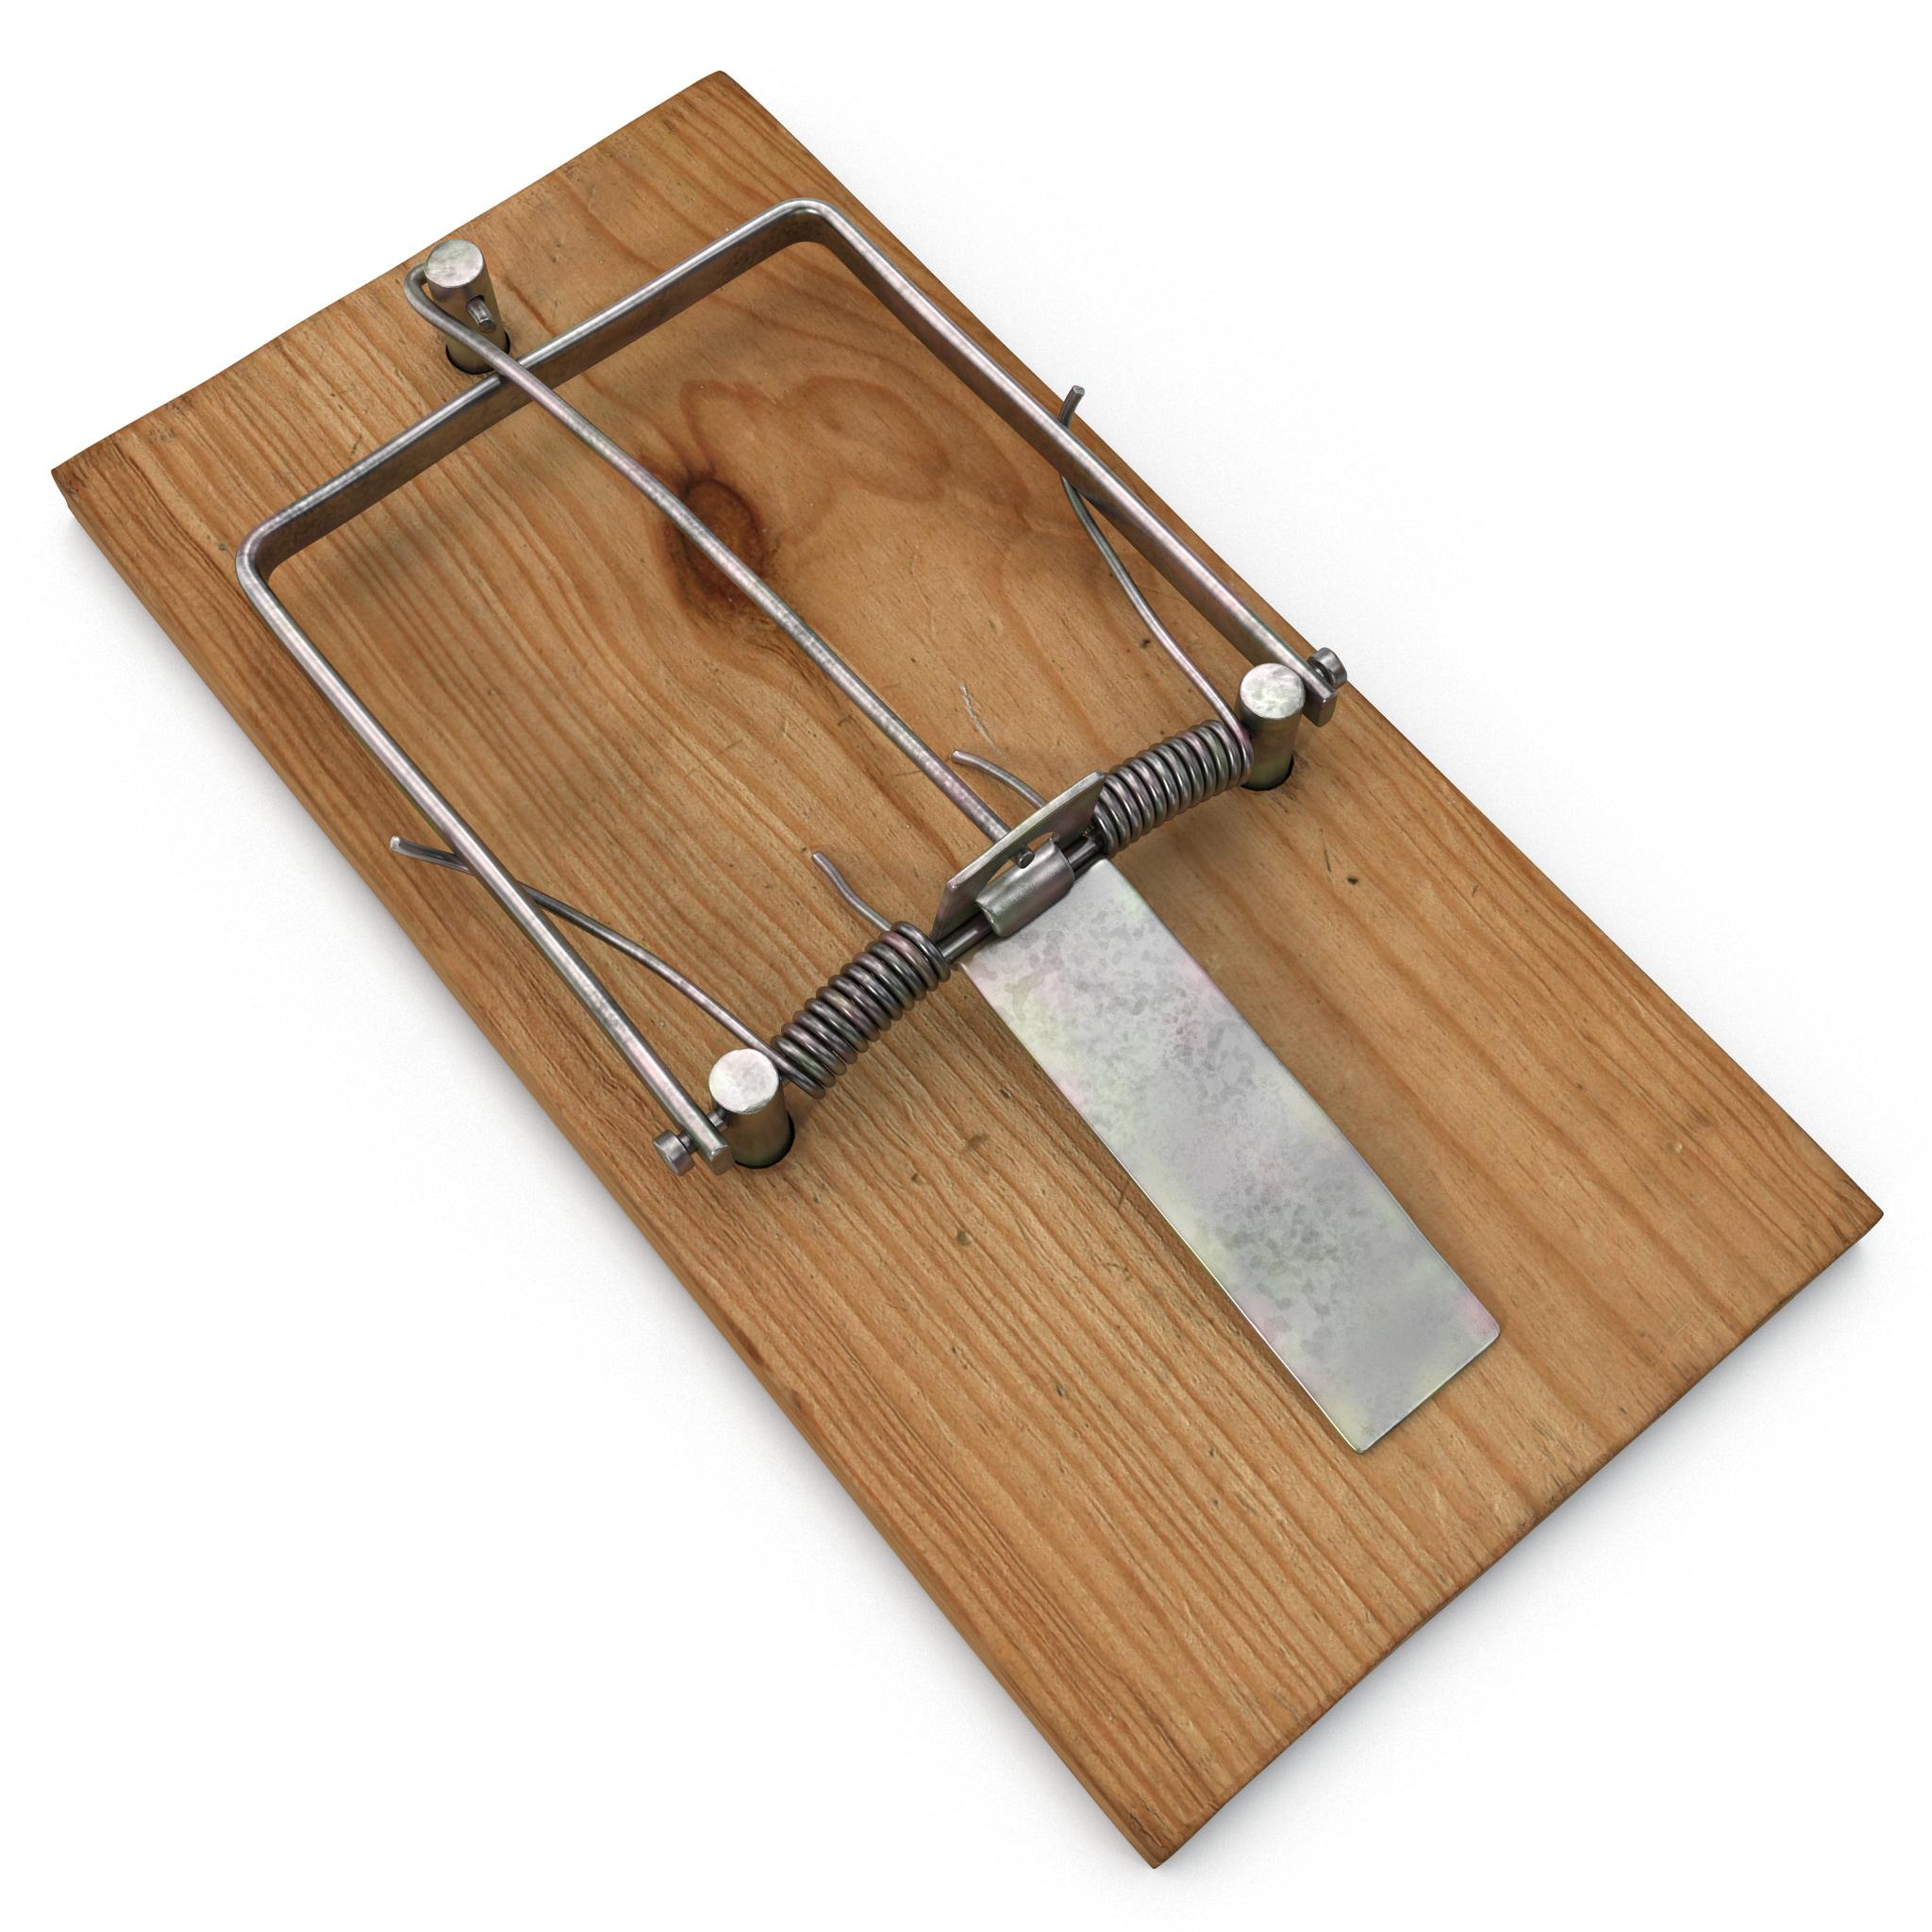 3d model mousetrap loaded